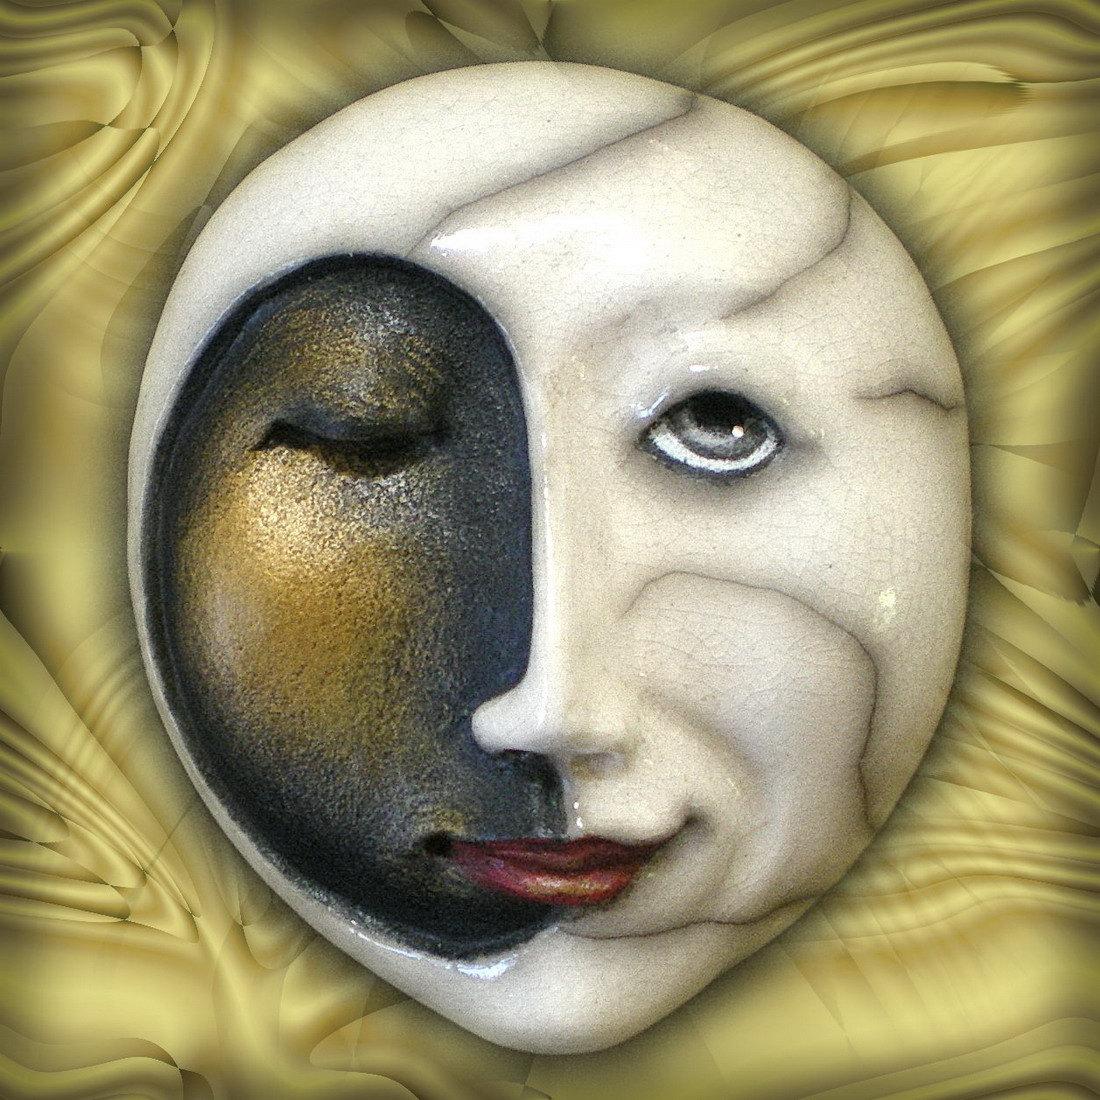 behind the mask: moonshine